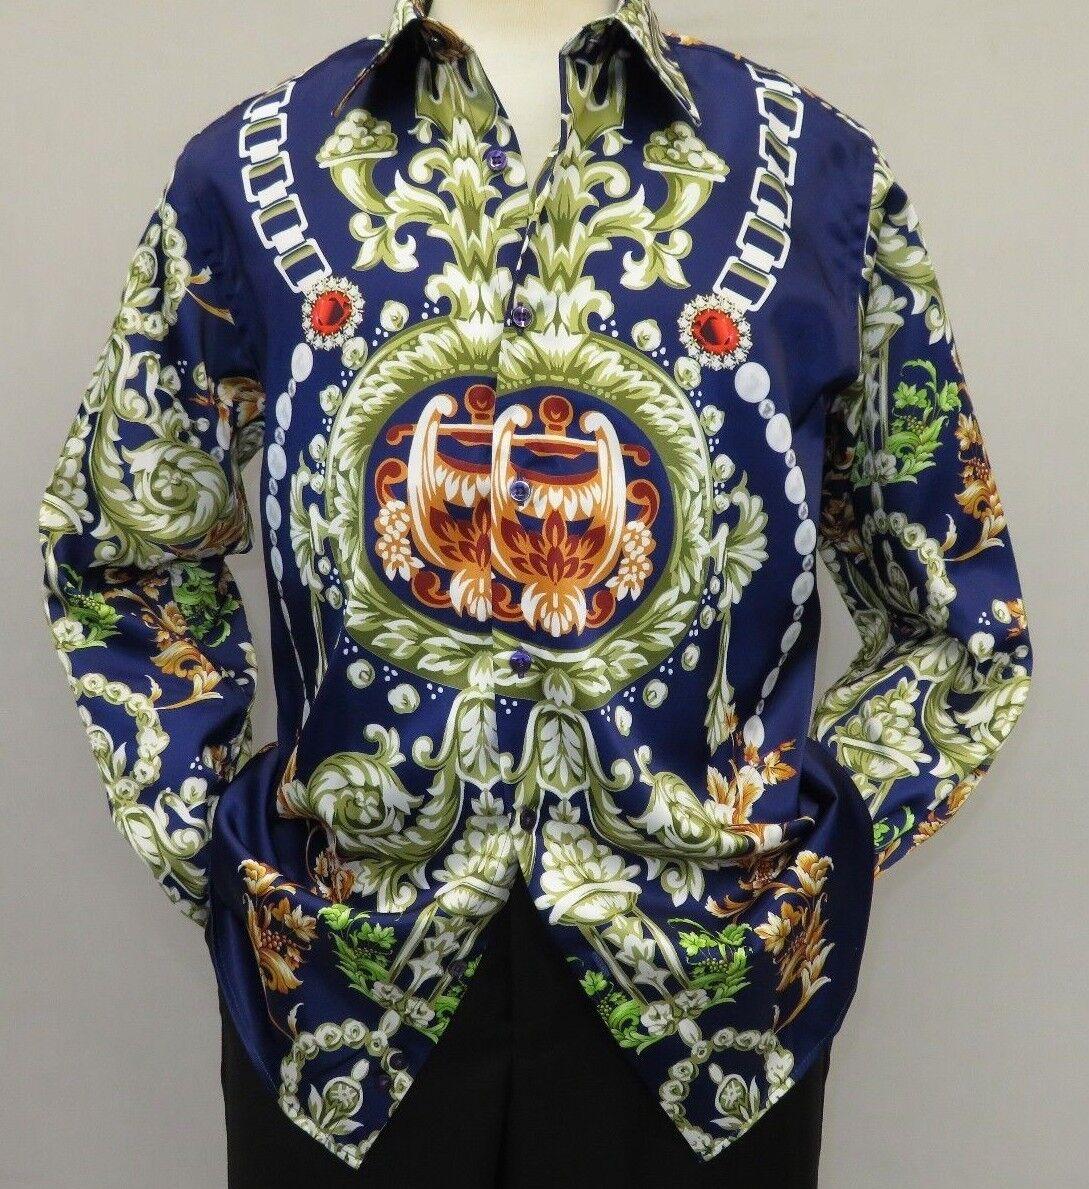 Men Oscar Banks Turkey Shirt Satin Entertainer Performer 6335-04 navy Floral